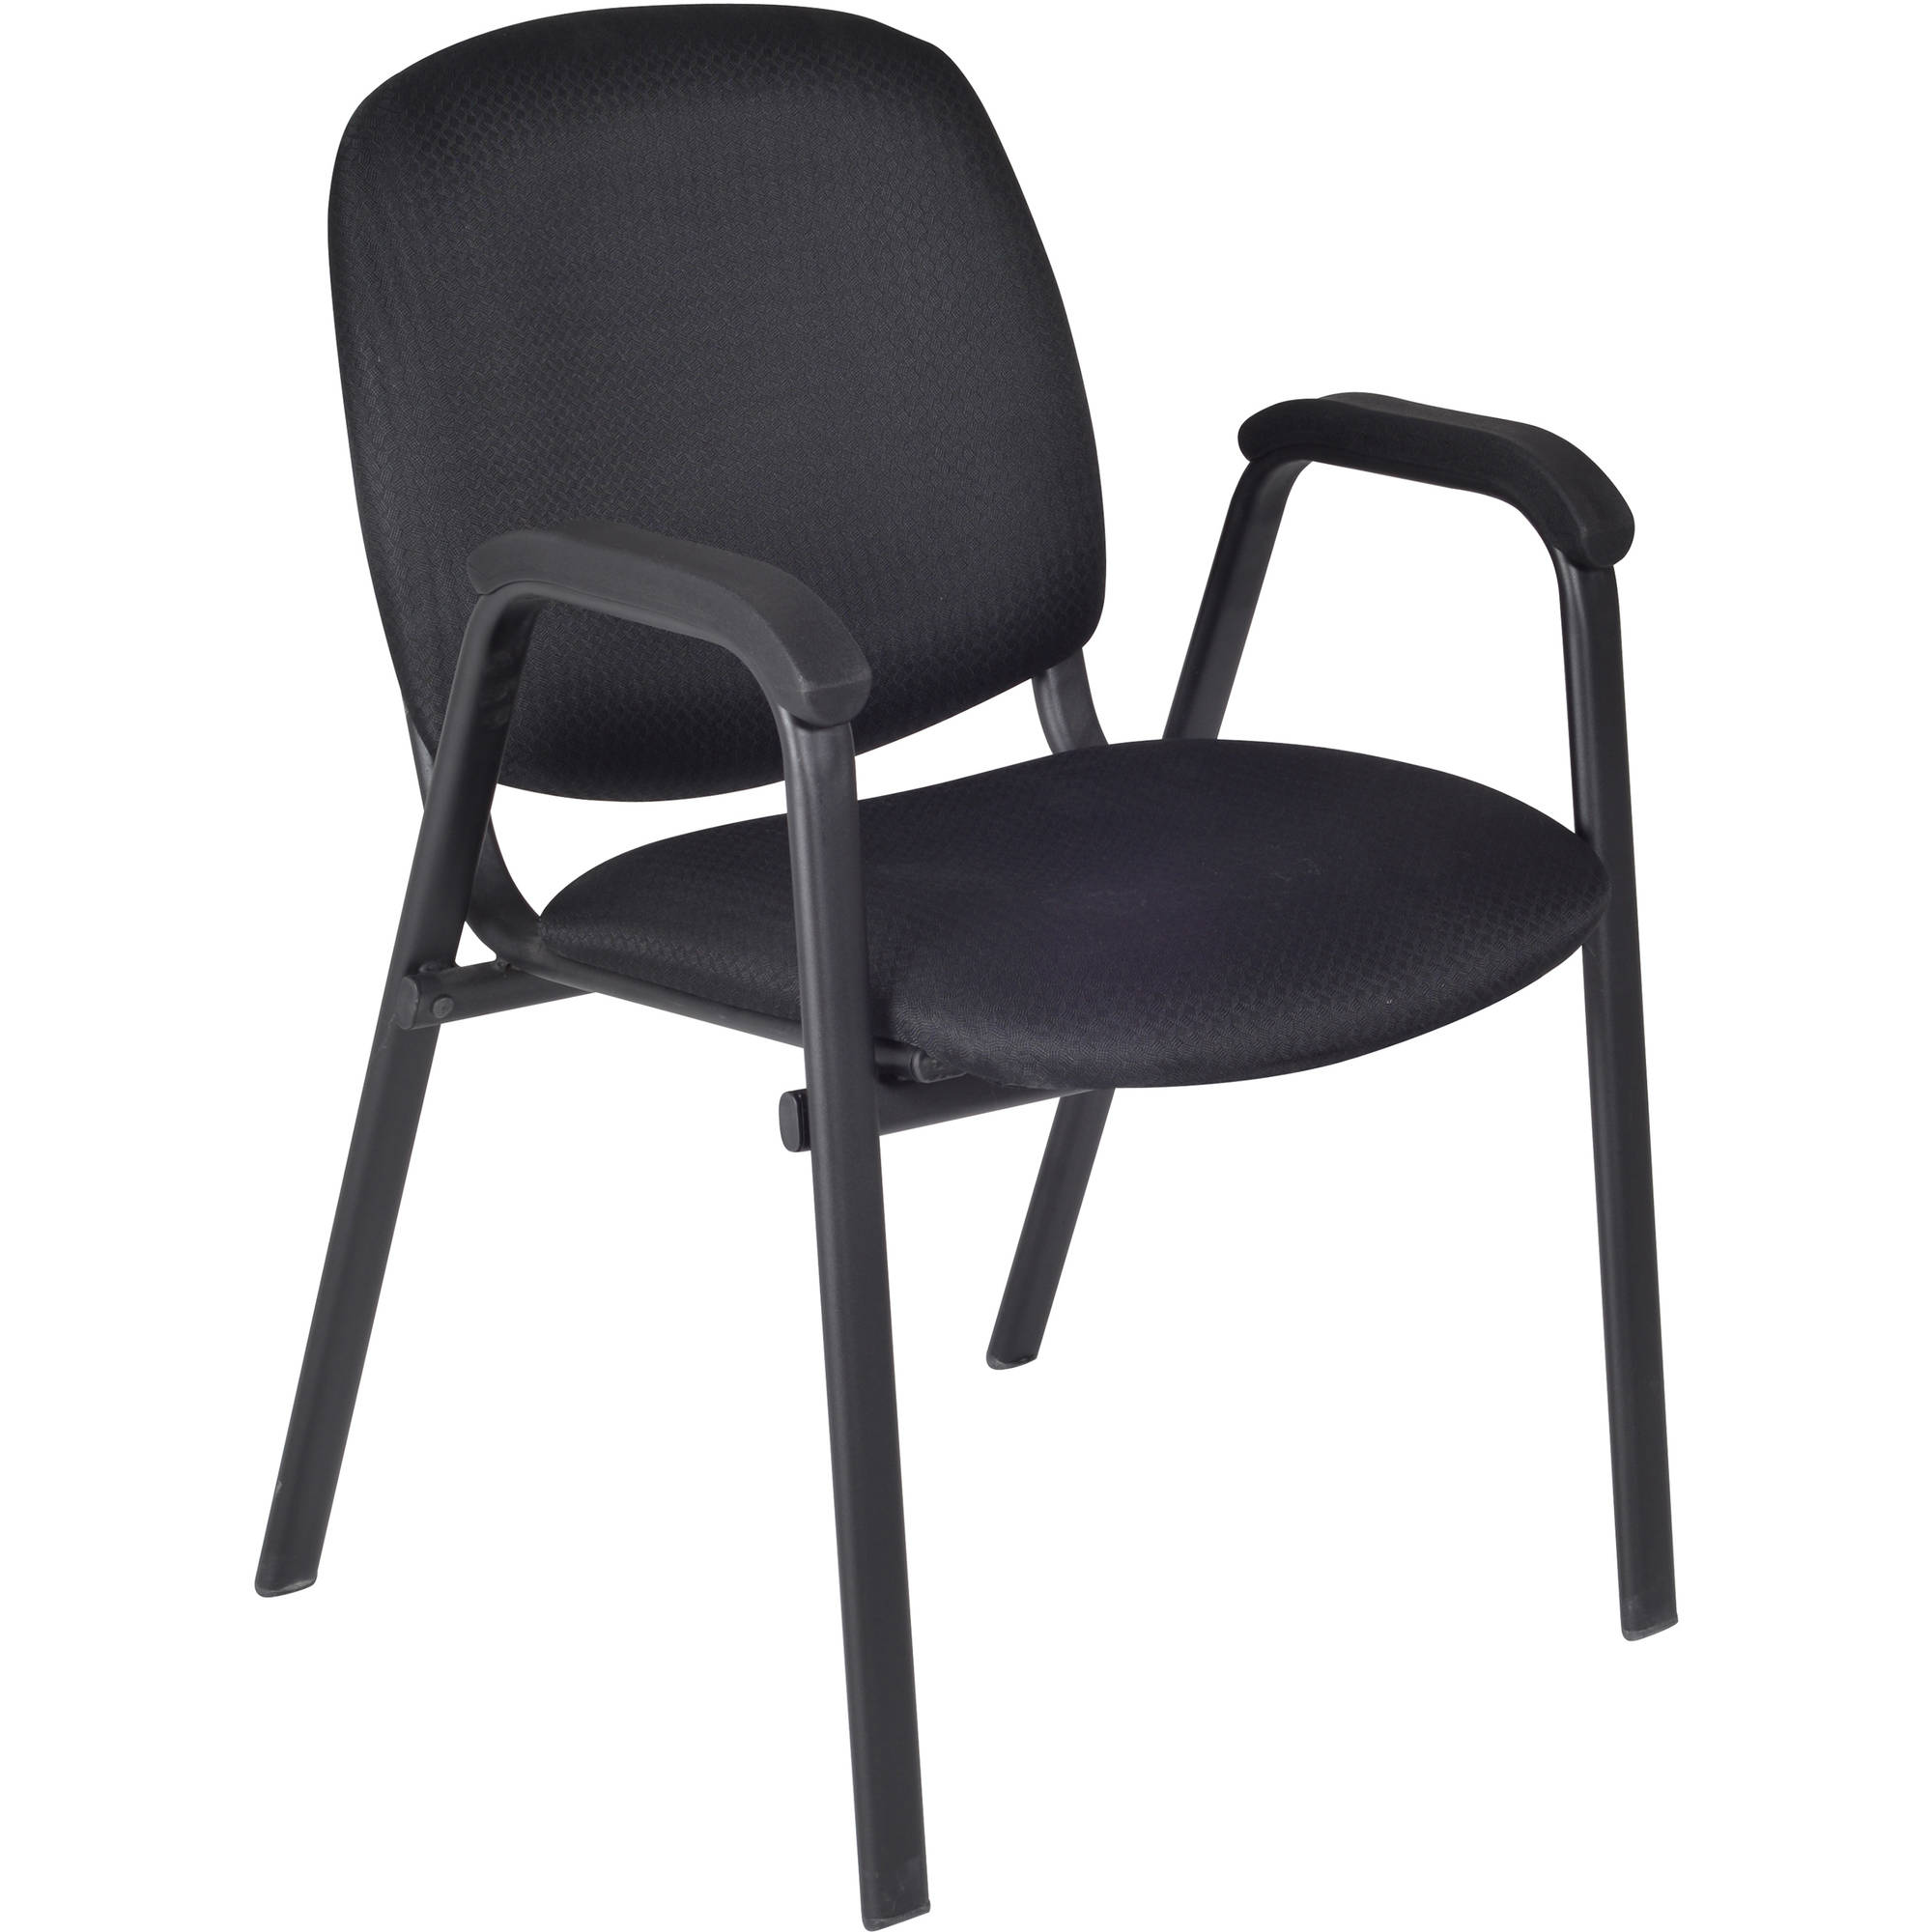 Regency Ace Stack Chairs, Black, 4pk